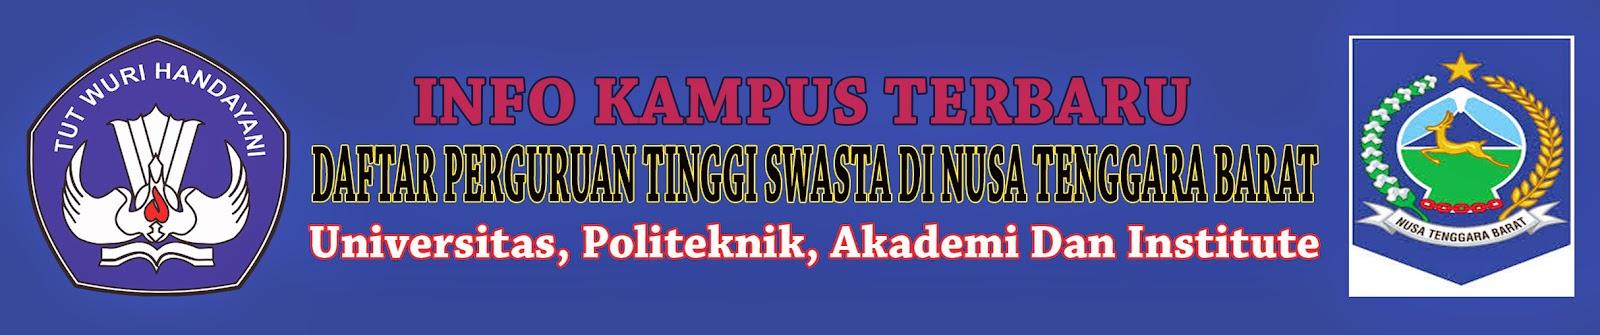 Daftar Perguruan Tinggi Swasta Di Nusa Tenggara Barat